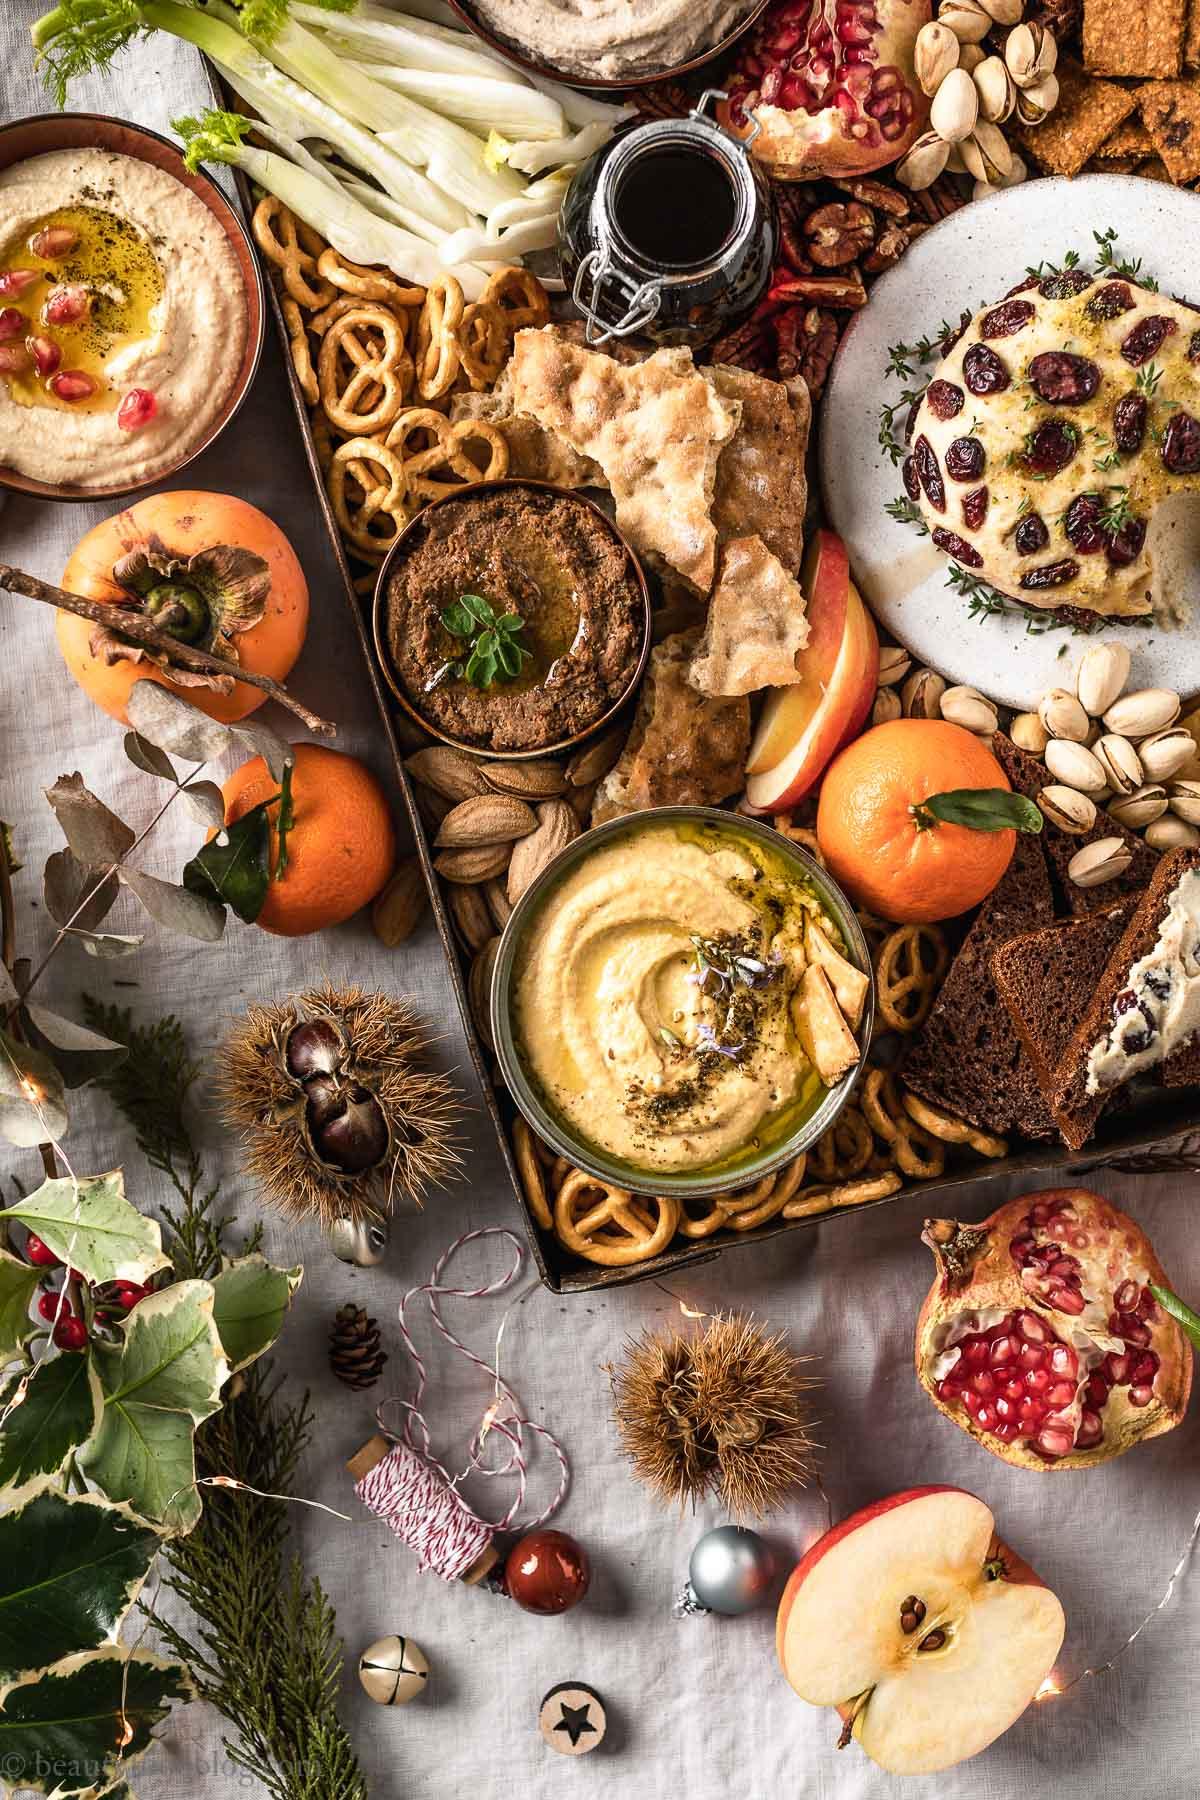 tris di hummus e paté Antipasti vegan di Natale e Capodanno Vegan Holiday Platter with hummus and lentil paté